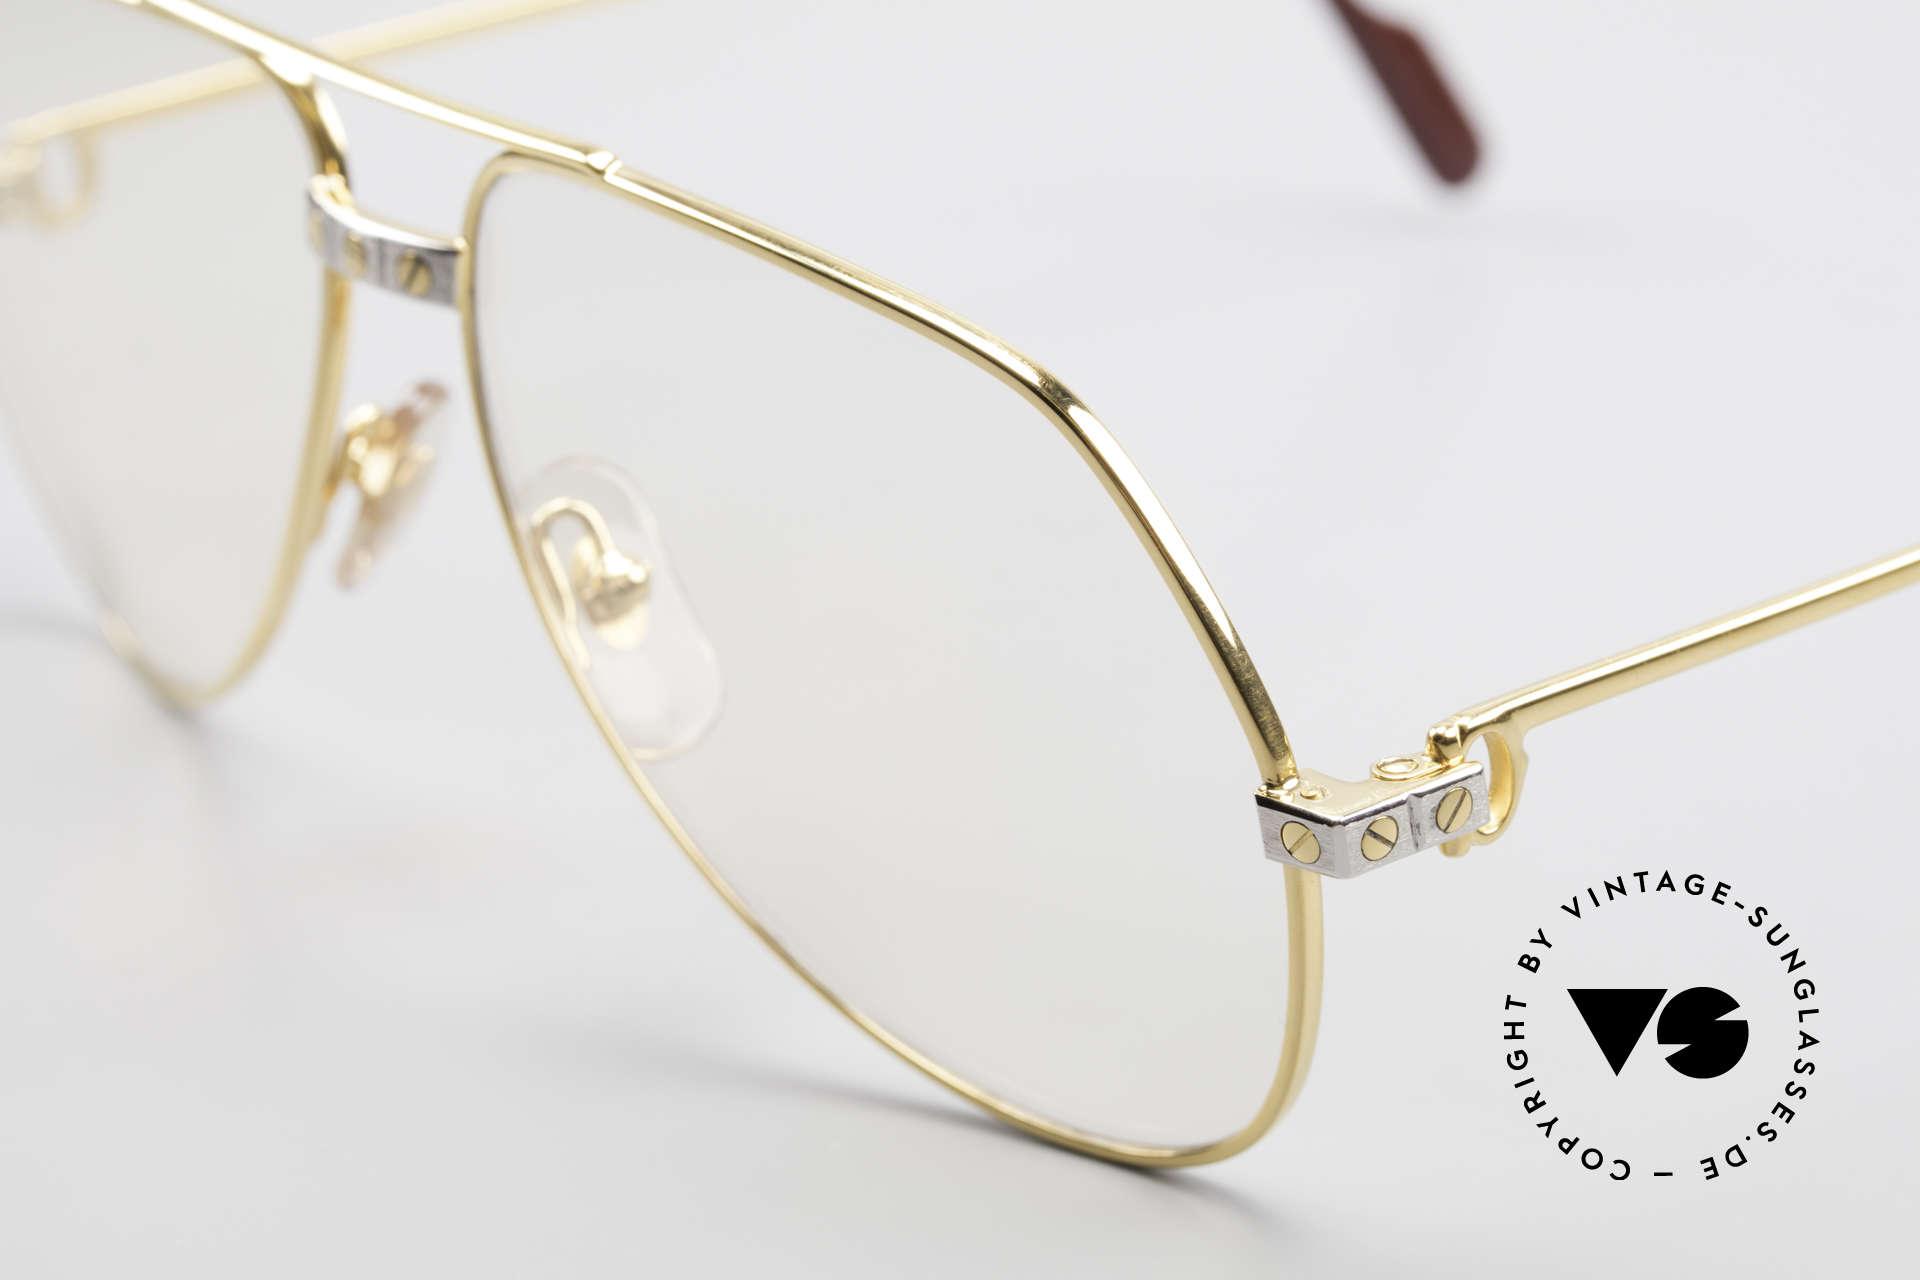 Cartier Vendome Santos - M Changeable Cartier Lenses, worn by actor Christopher Walken (JAMES BOND, 1985), Made for Men